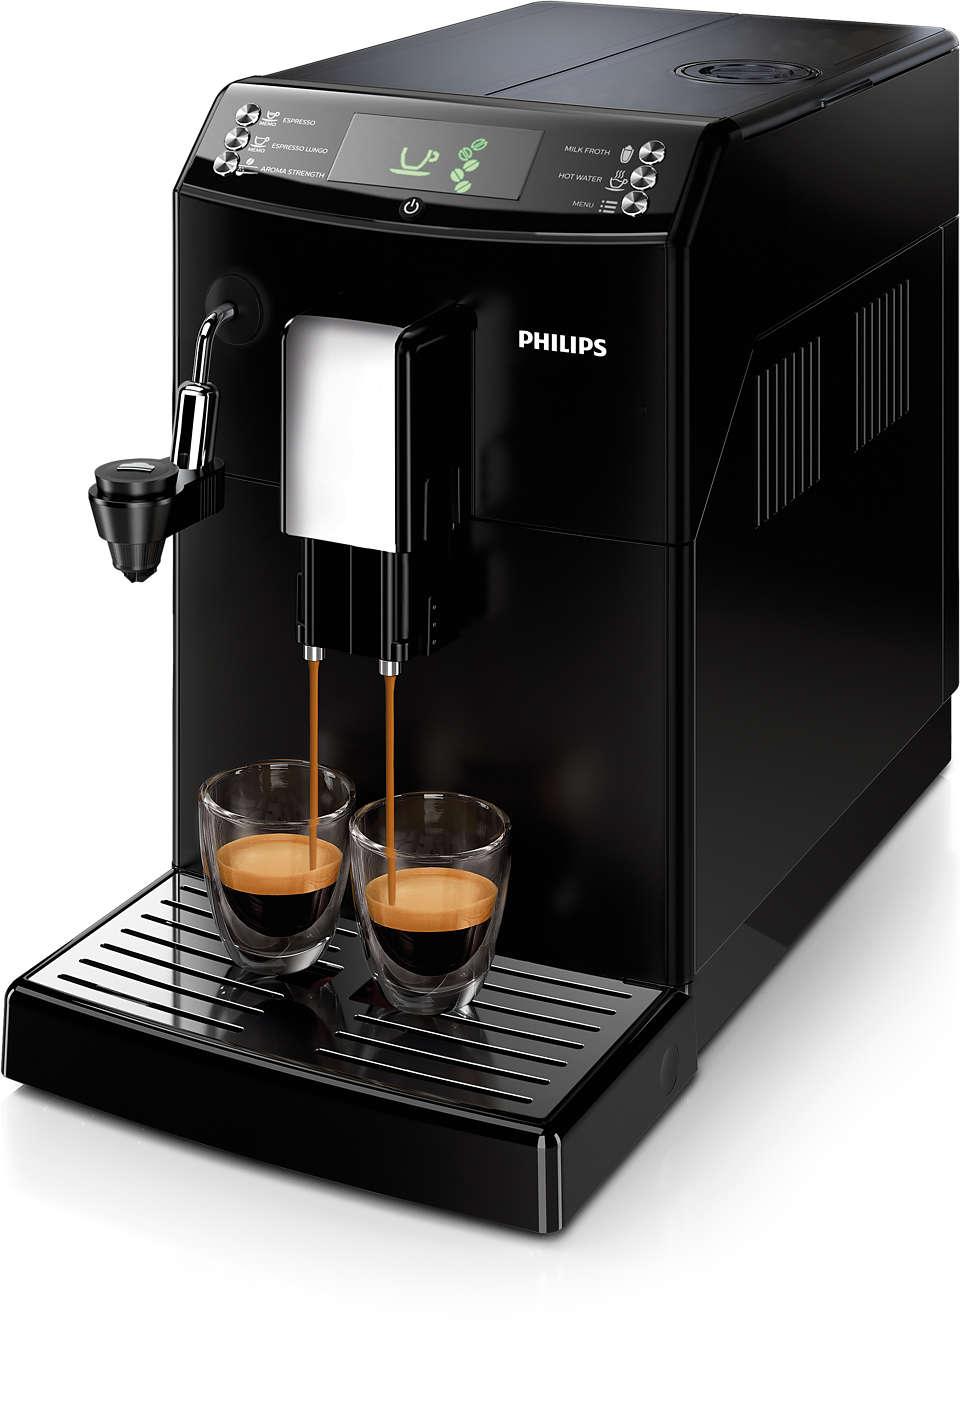 Café con un solo toque, justo a tu gusto